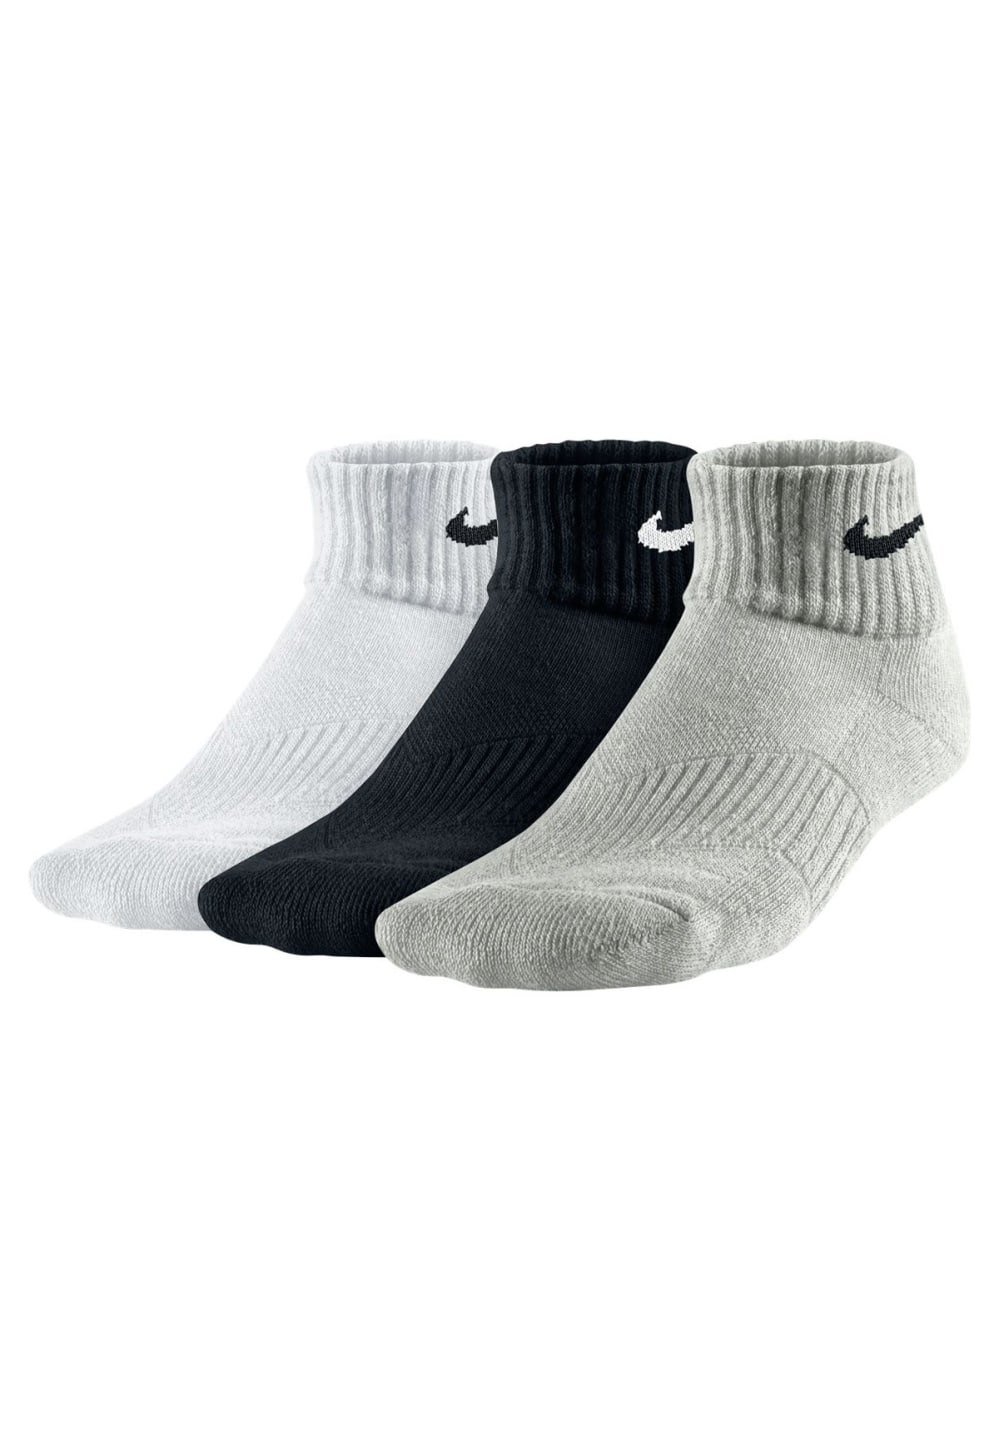 Nike Performance Cushion Quater Socks 3 PPK Laufsocken Kinder 34–38, Gr. 34–